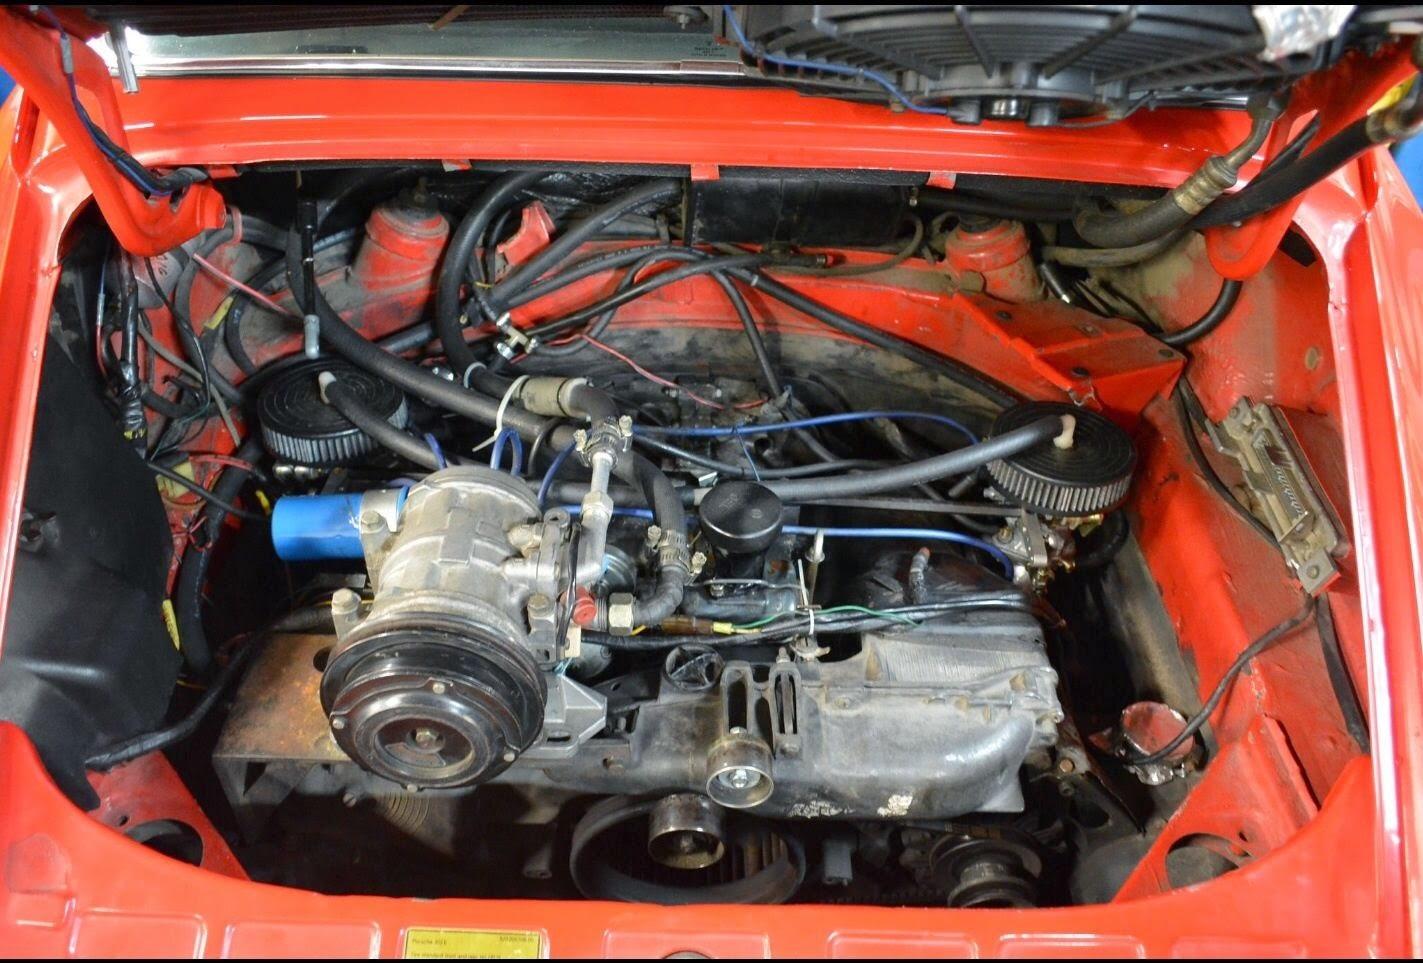 1976 porsche 912e excellent condition - buy classic volks 1976 porsche 912e engine diagram